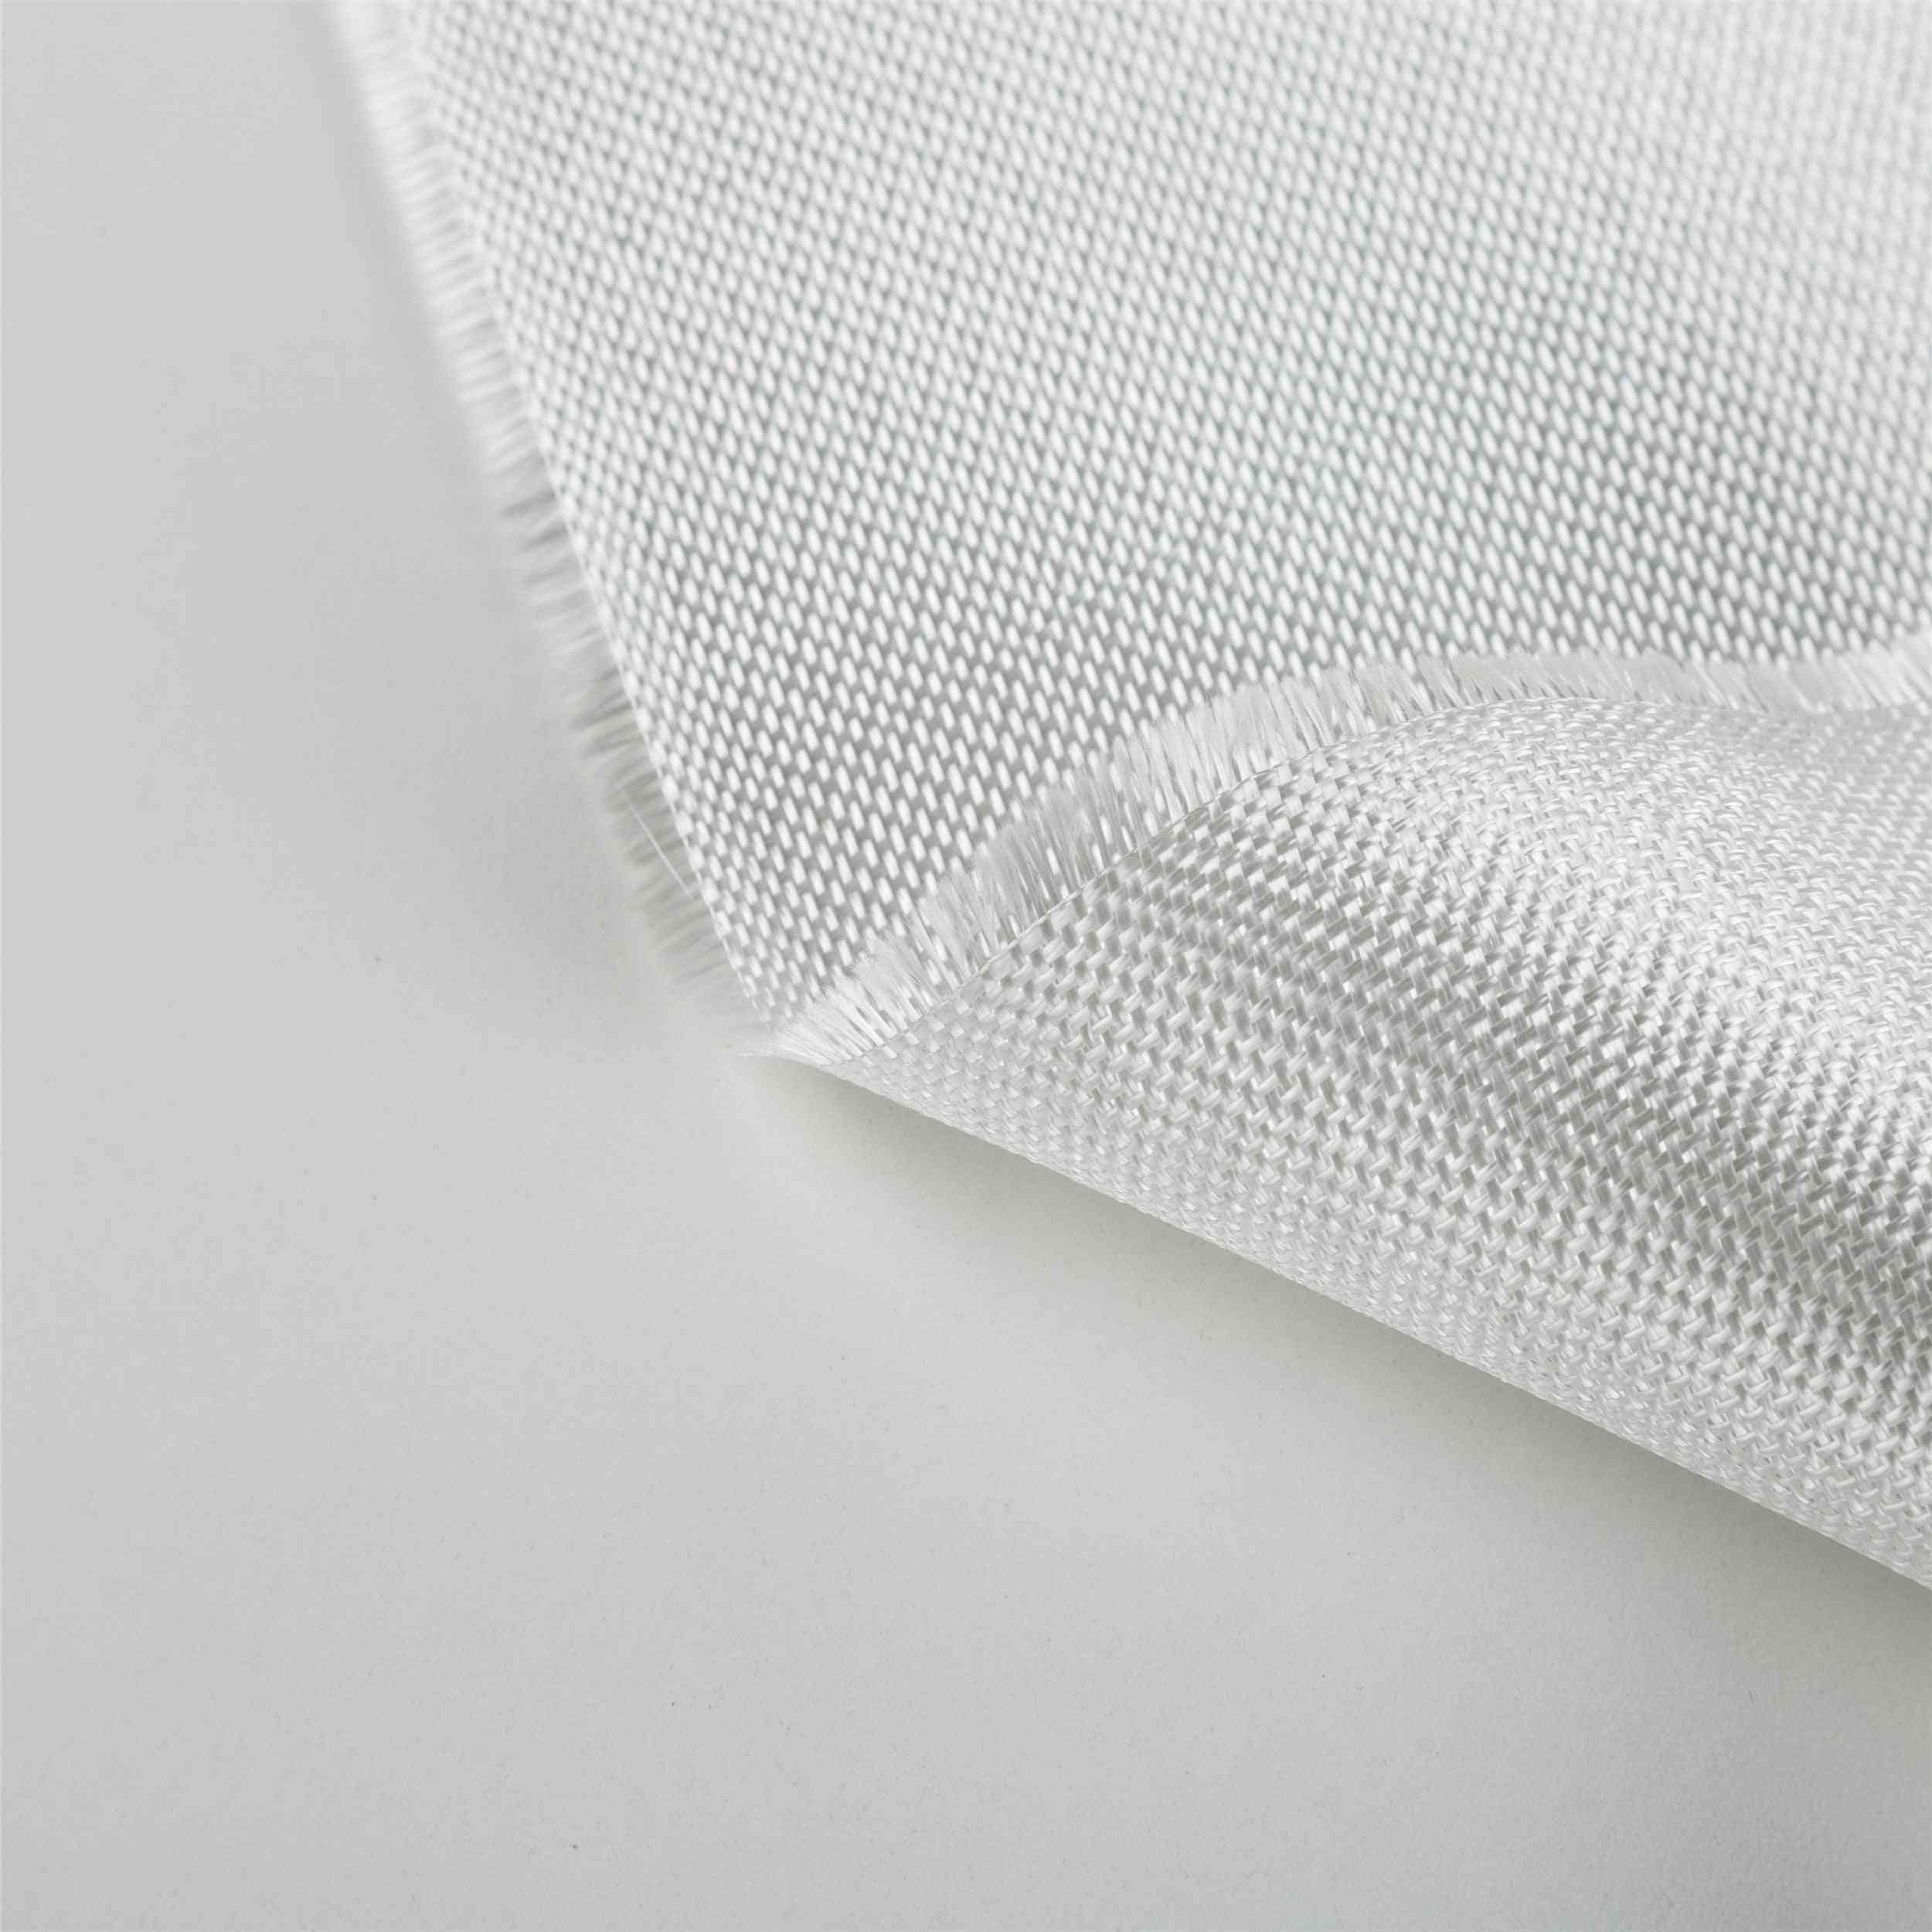 E-glass Fiberglass Plain Weave, Tear And Cut Resistant, Woven Fabric, Reinforced Cloth